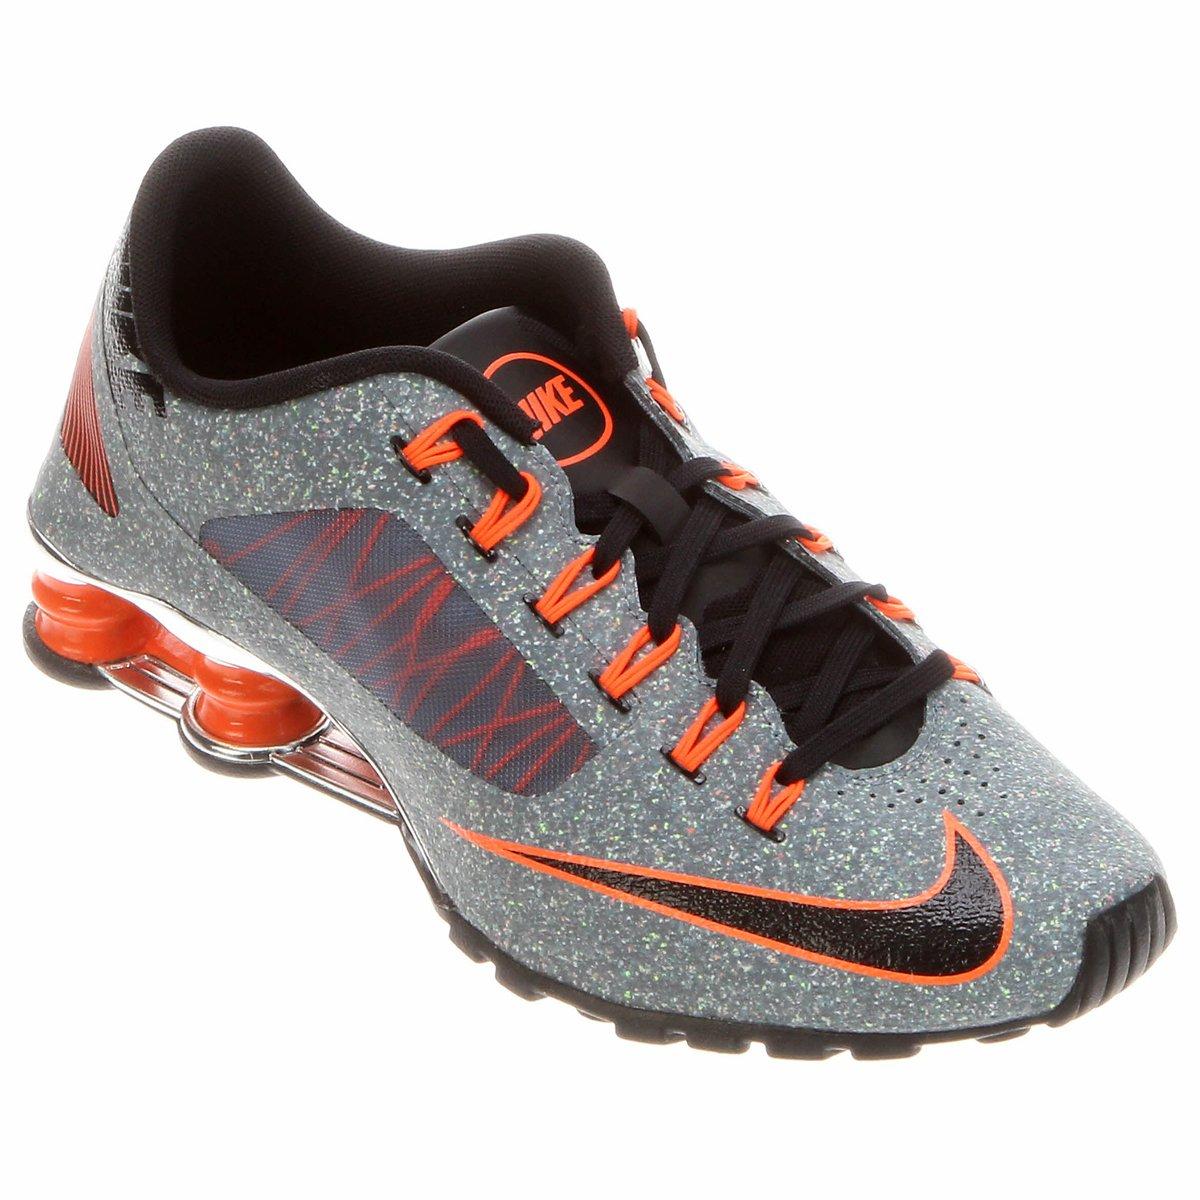 san francisco 249fa 20206 Nike Shox R4 plus Flywire